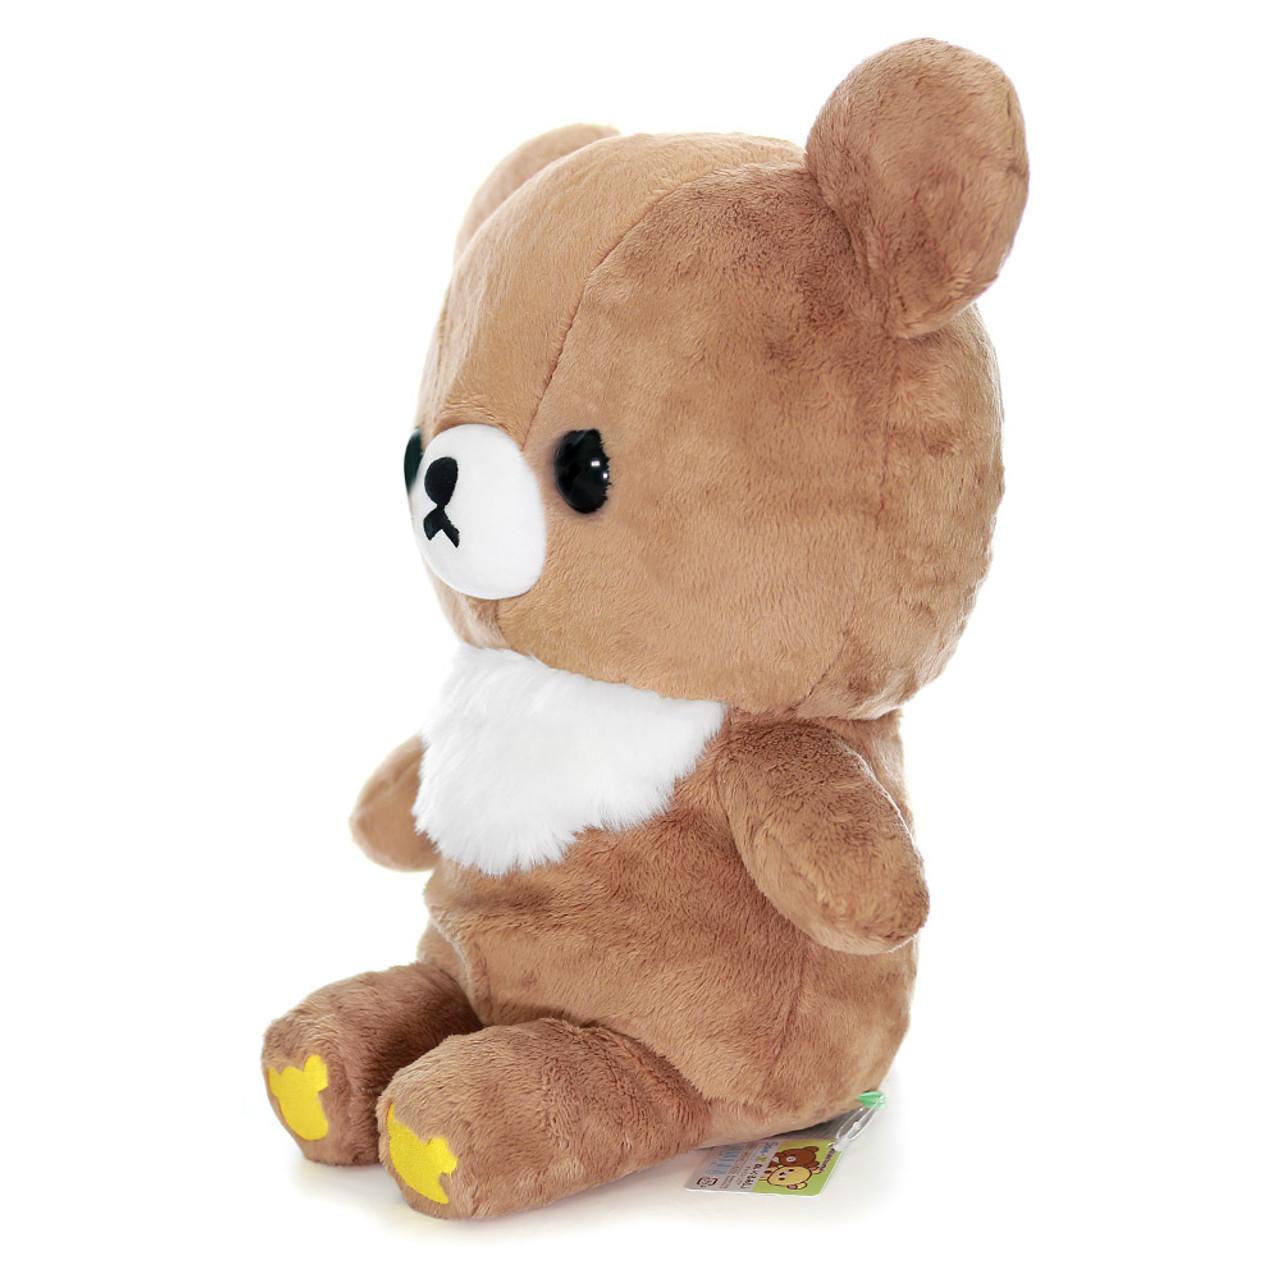 San-x Cute Sweet Chairoikoguma Bear Stuffed Animal Toy L MR94401 ( Side View )